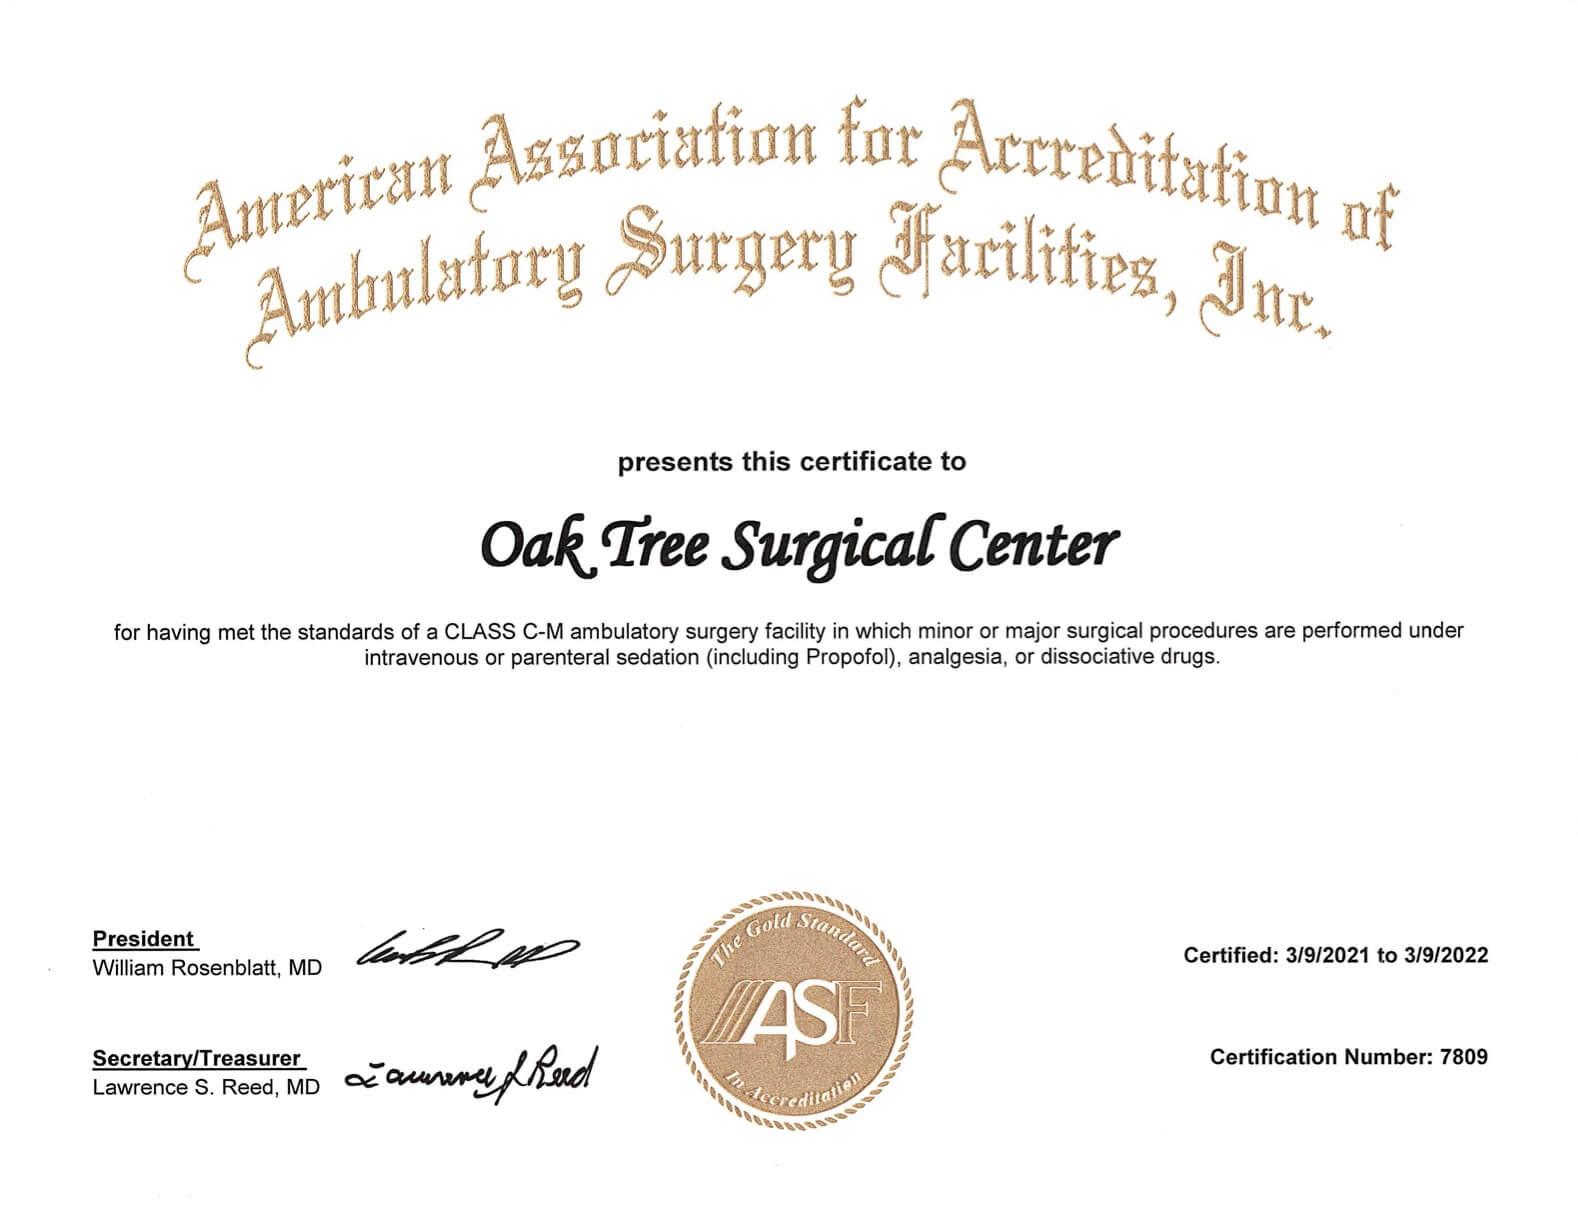 American Association for Accreditation of Ambulatory Surgery Facilities, Inc. certification